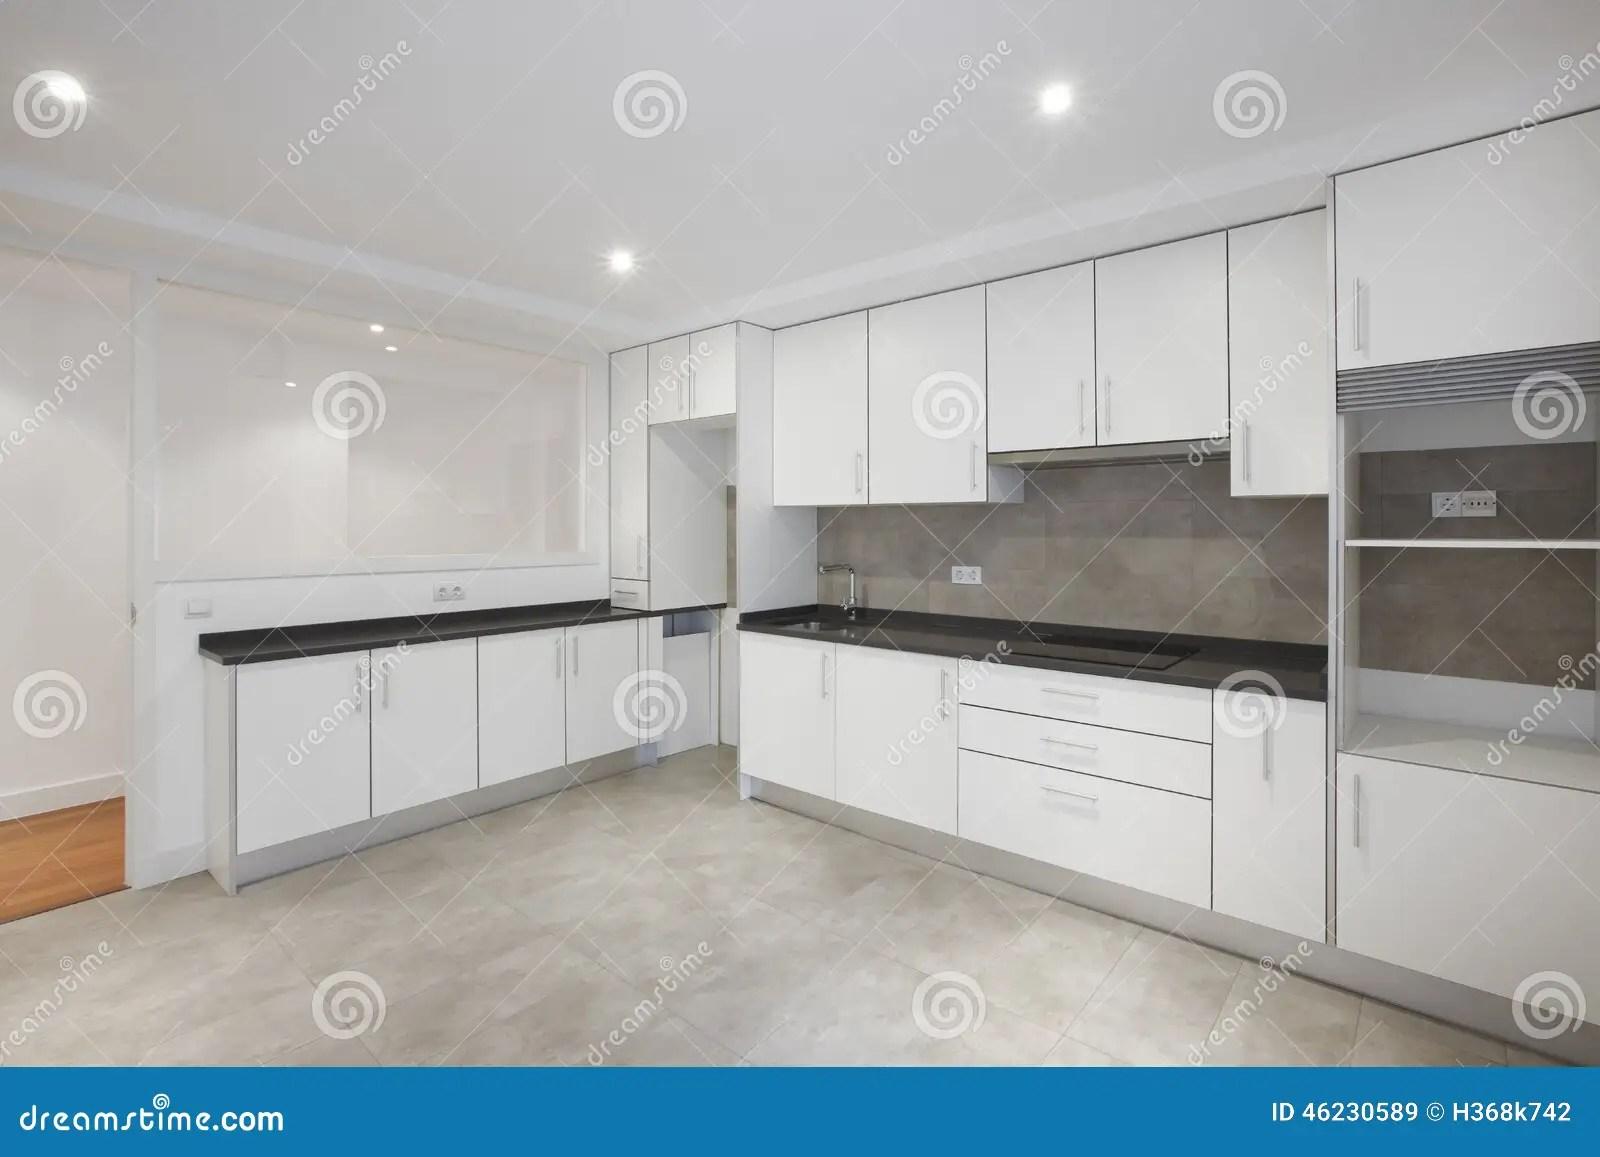 empty house kitchen white furniture stock photo image modular kitchen furniture kolkata howrah west bengal price